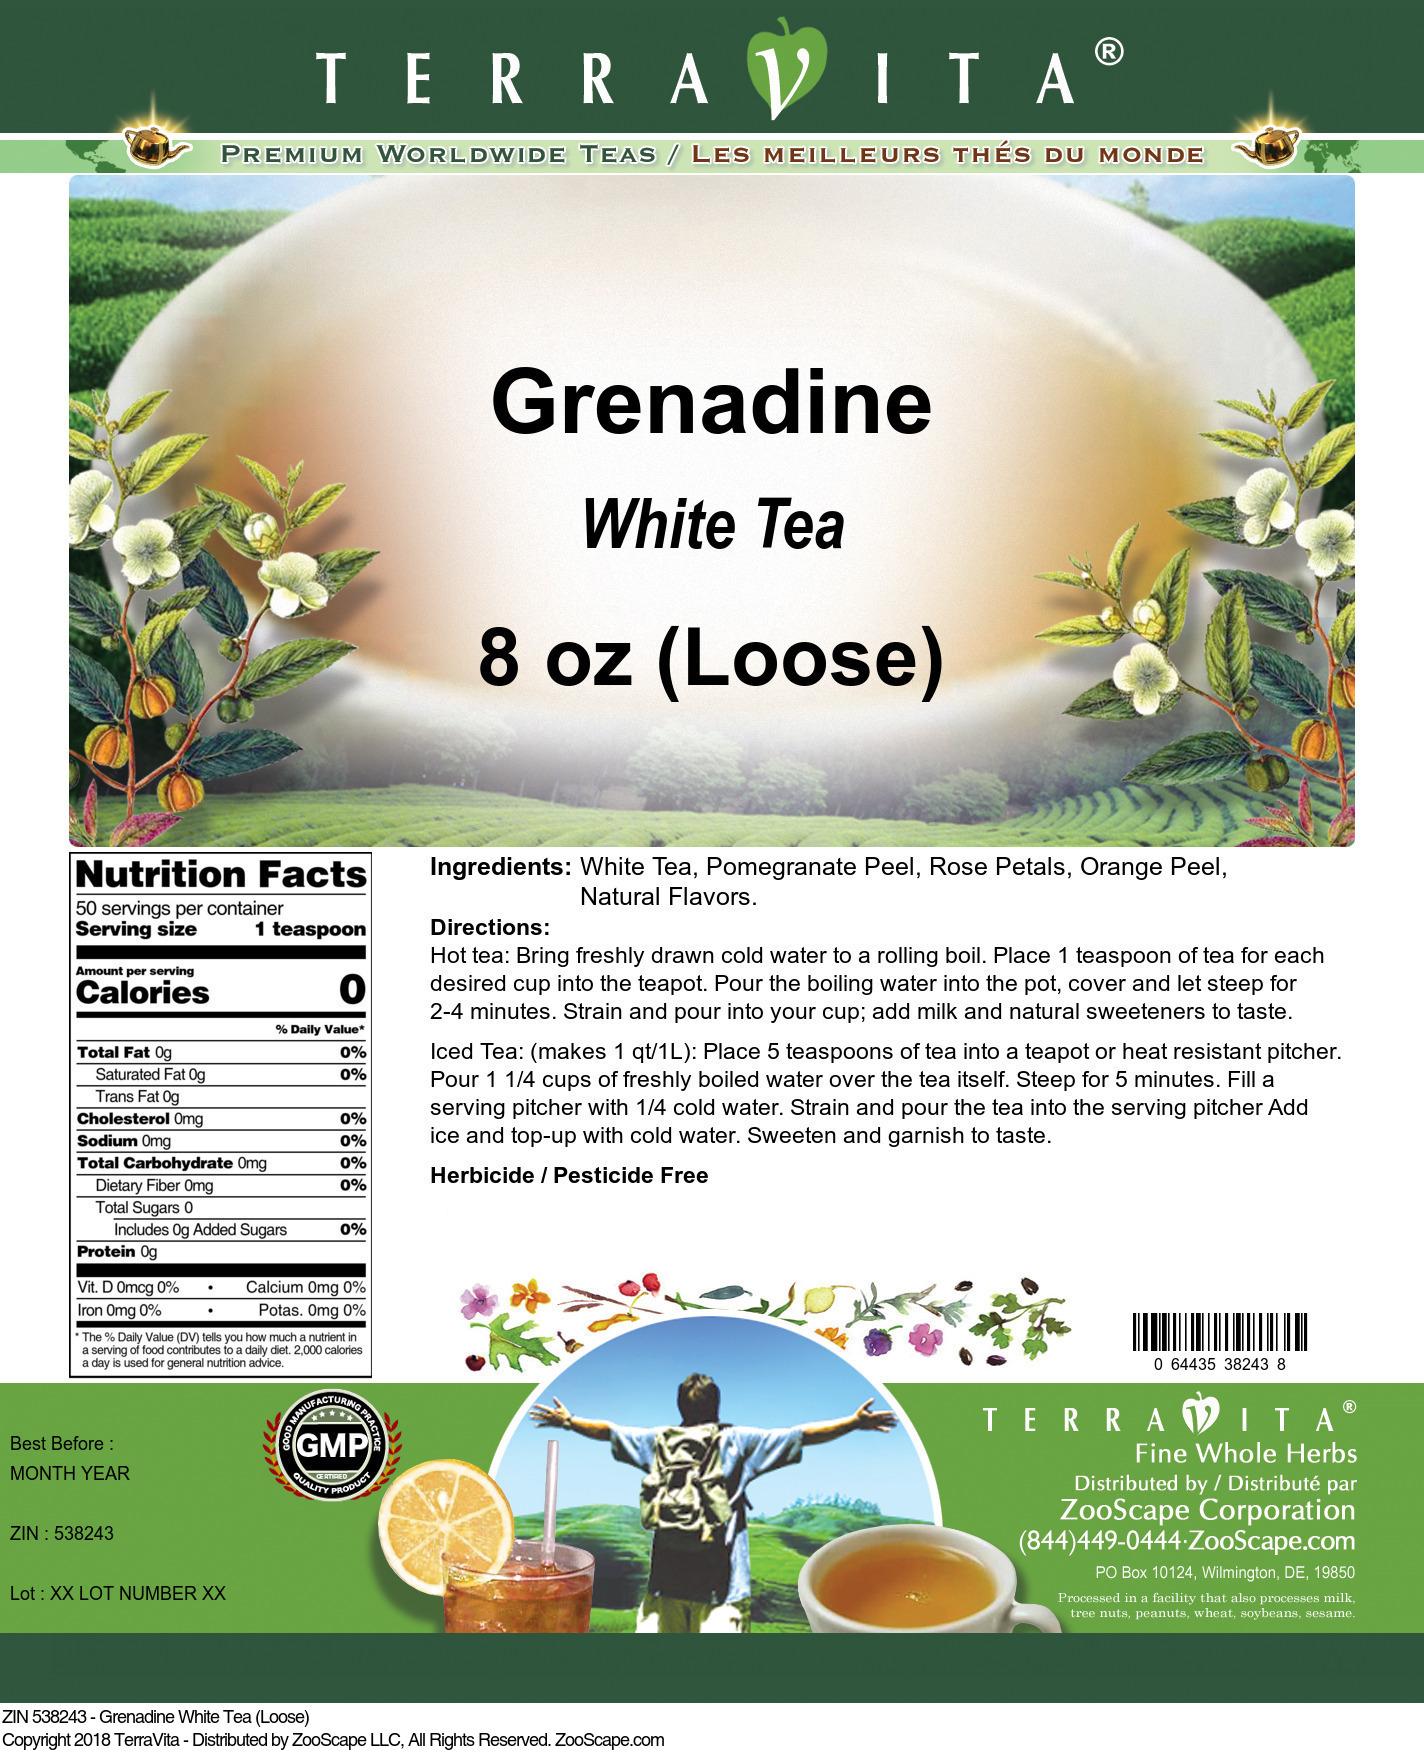 Grenadine White Tea (Loose)